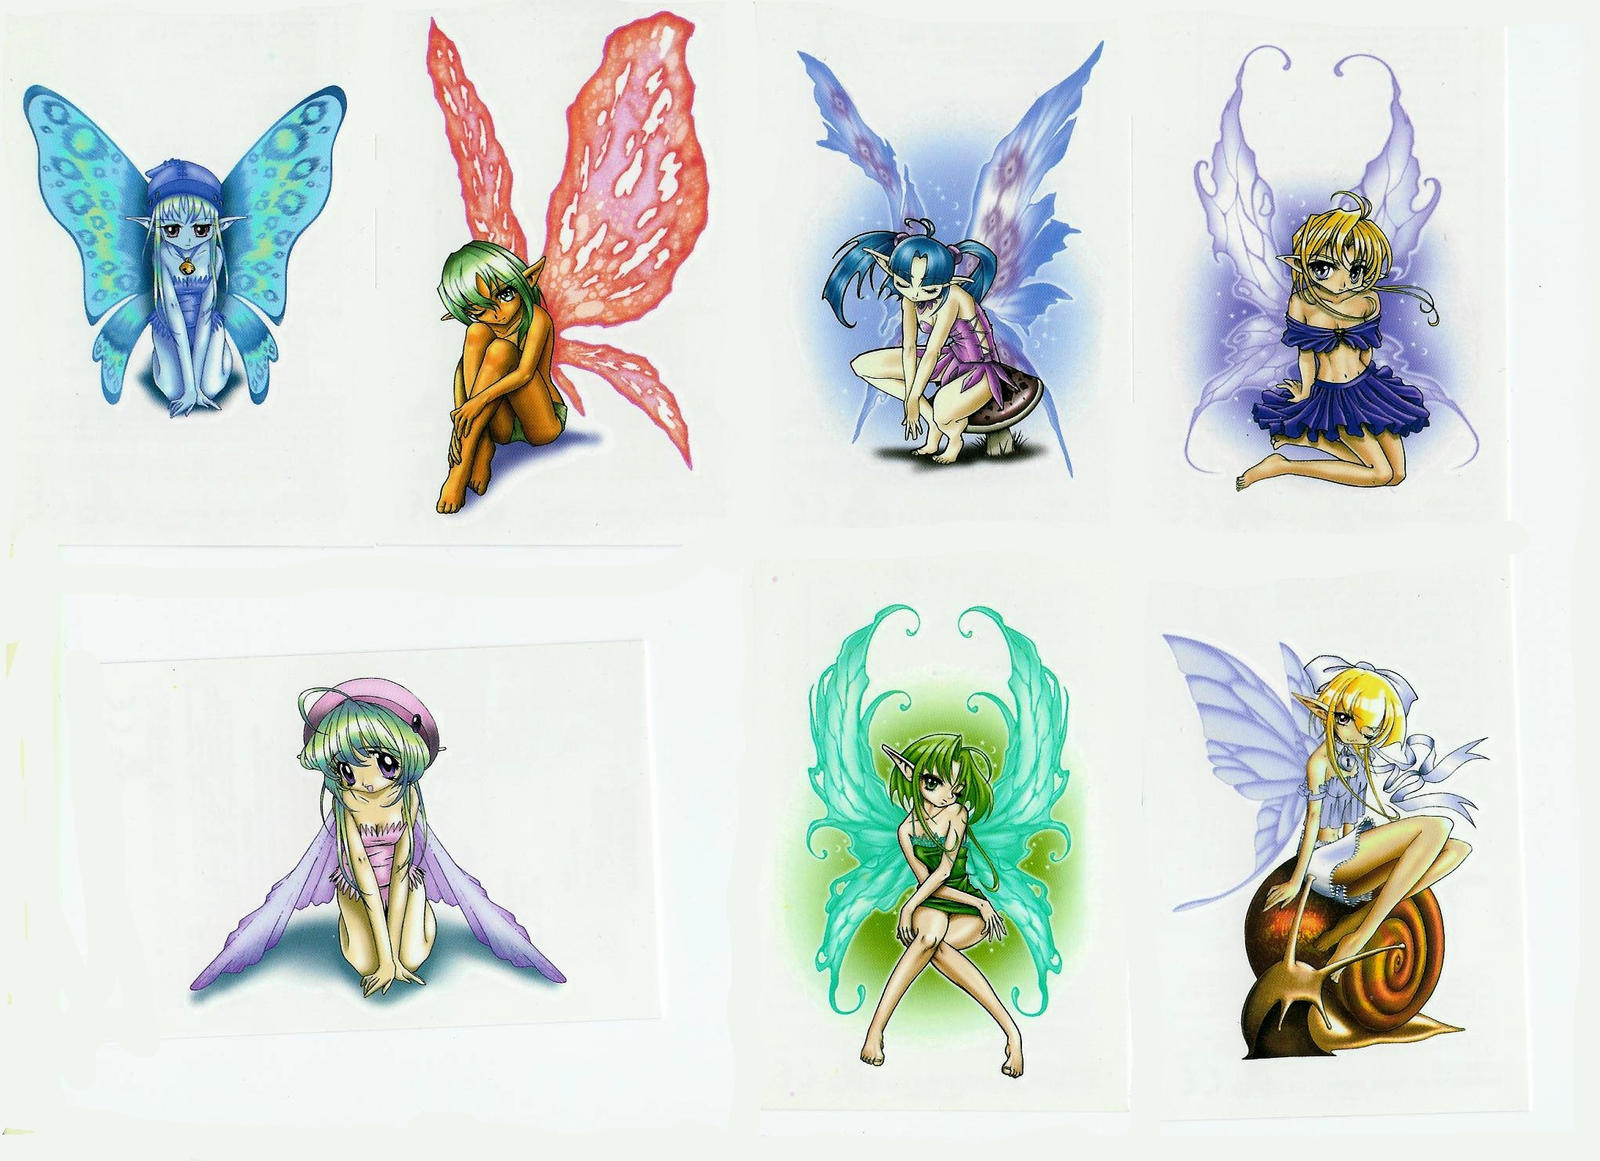 Anime Fairy Wallpaper 2 by Vernamon